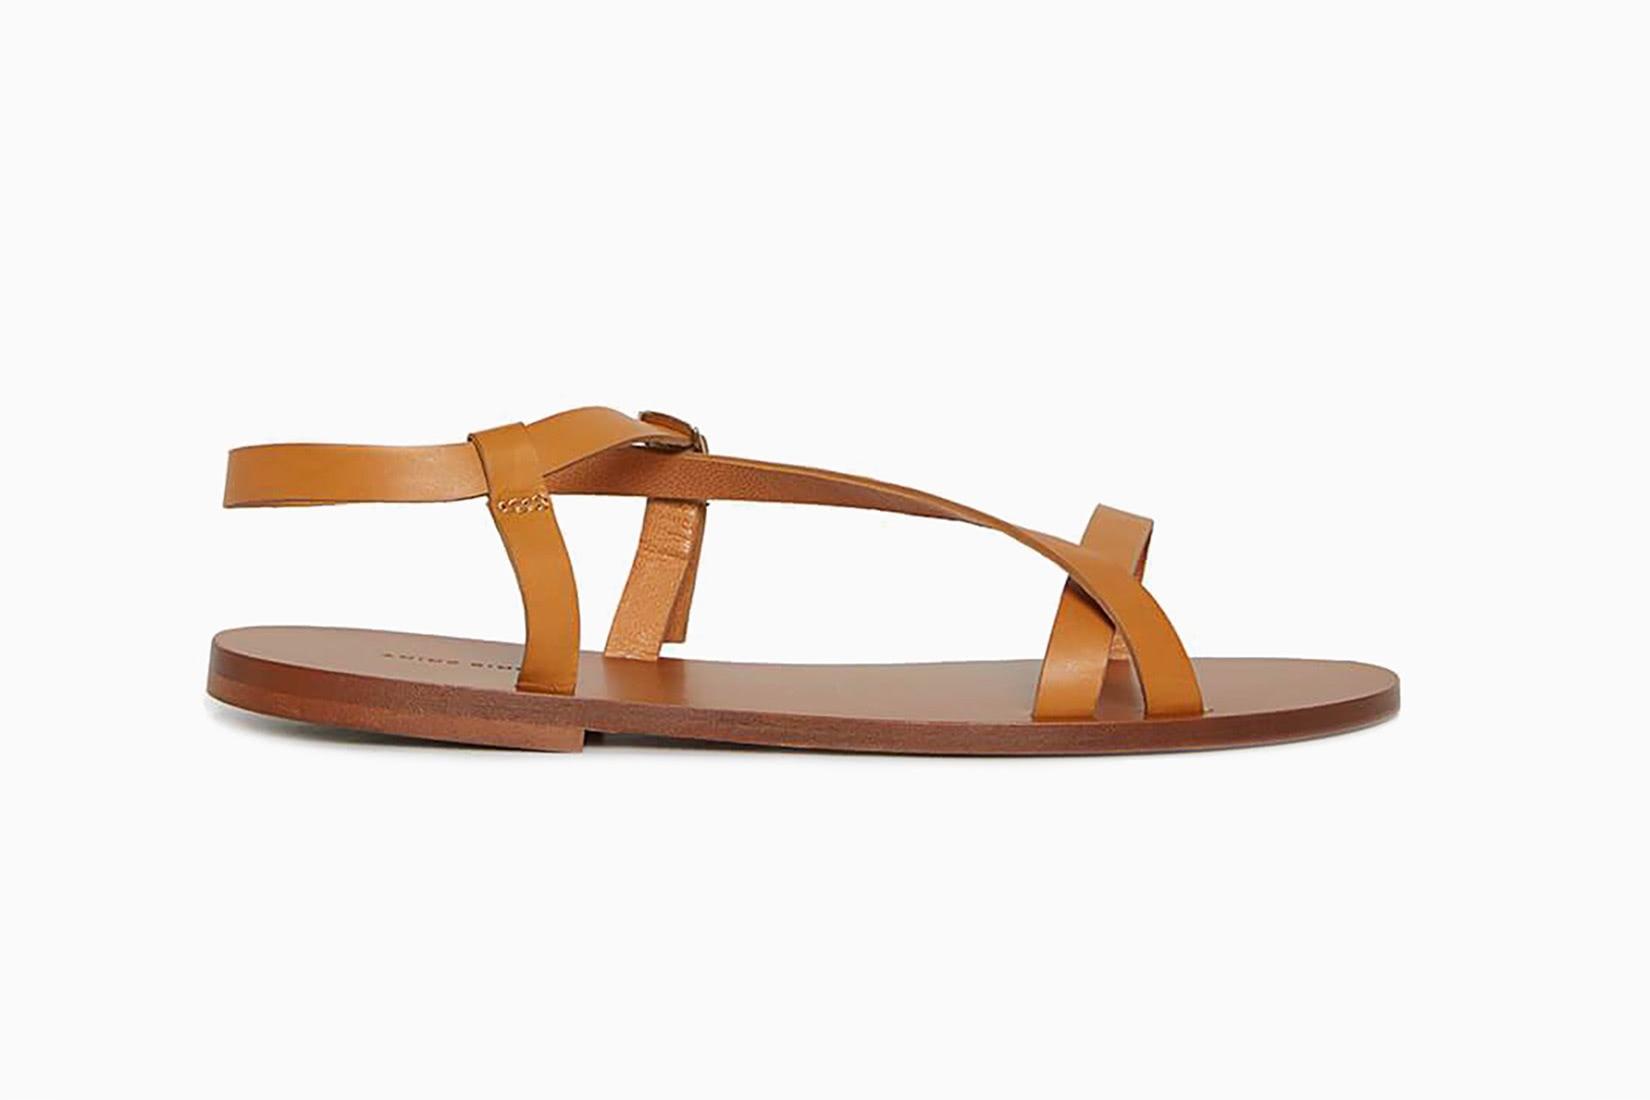 best women walking shoes anine bing rocco flats sandals - Luxe Digital